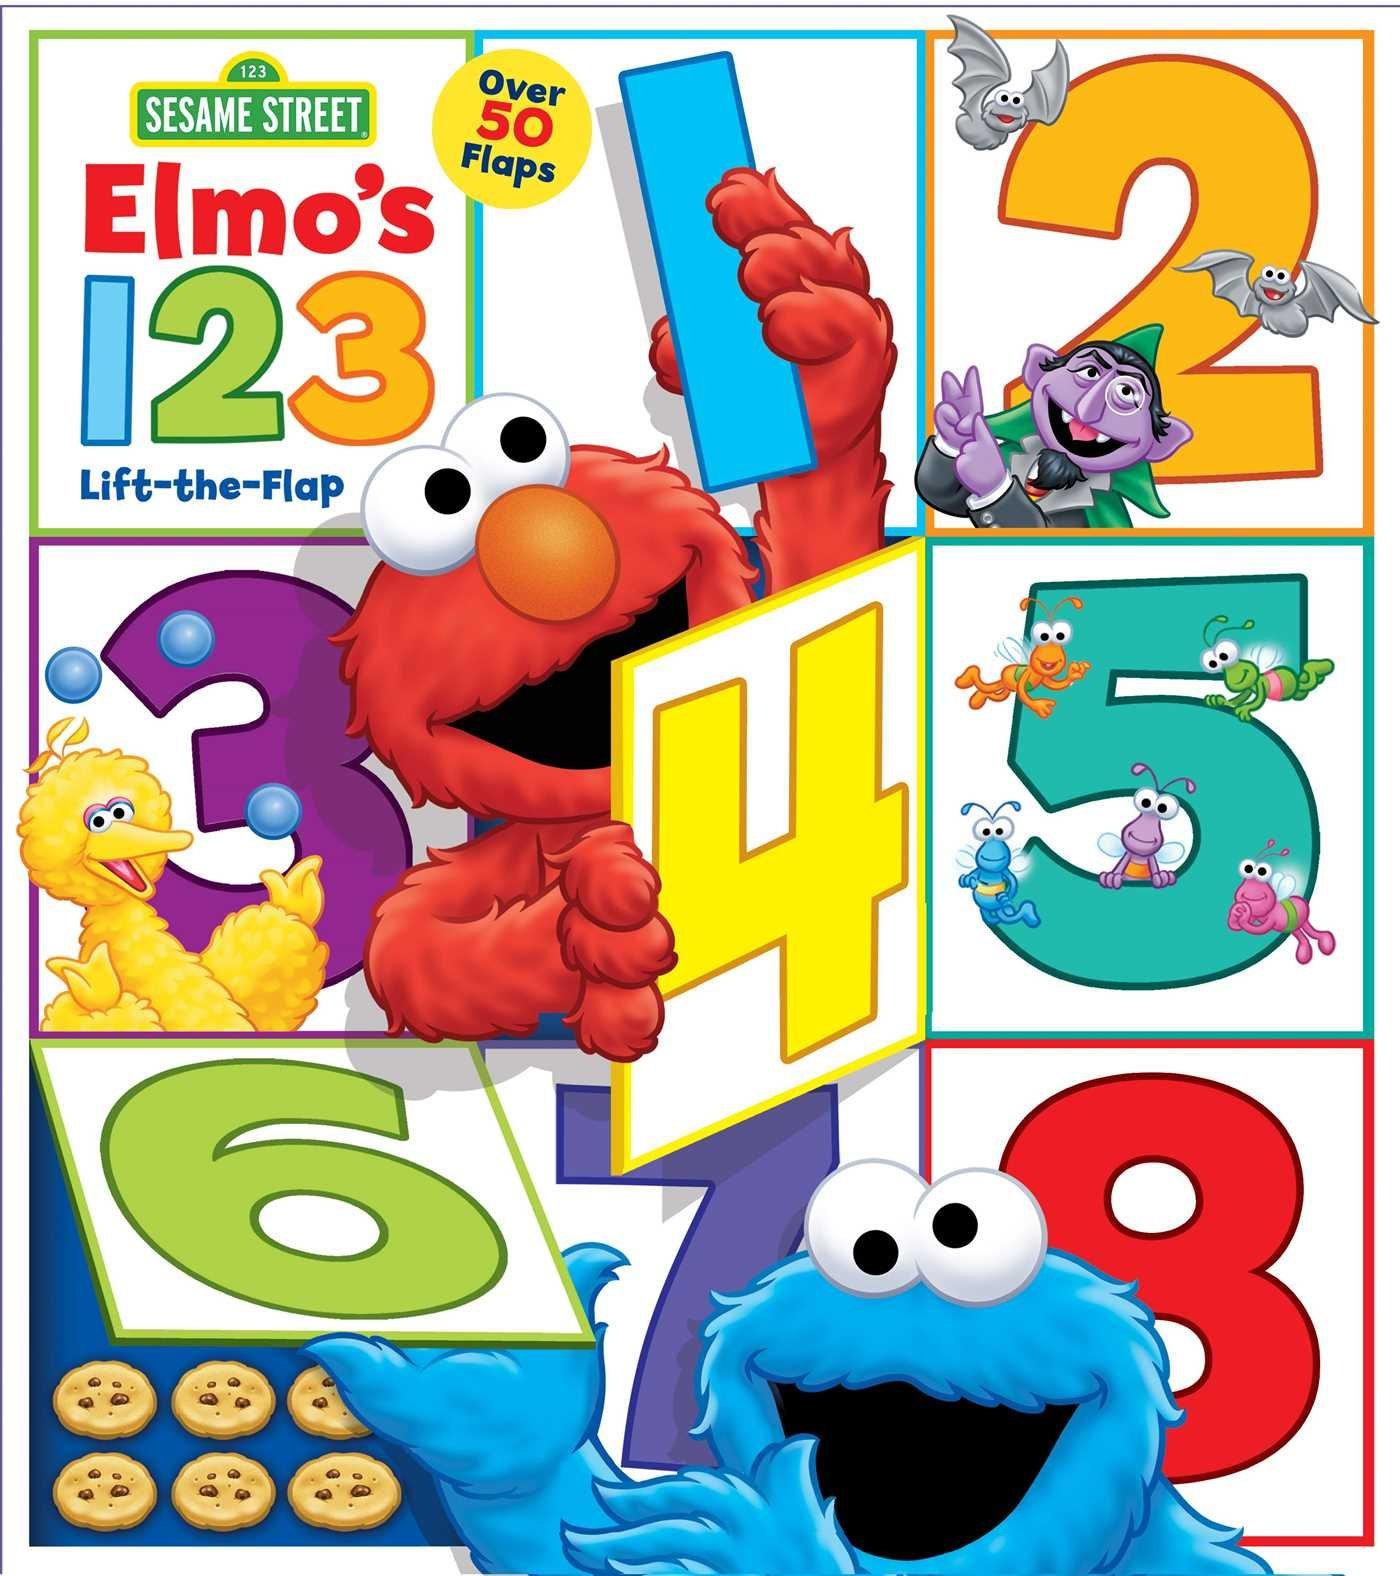 Elmo's 123 Lift-the-Flap